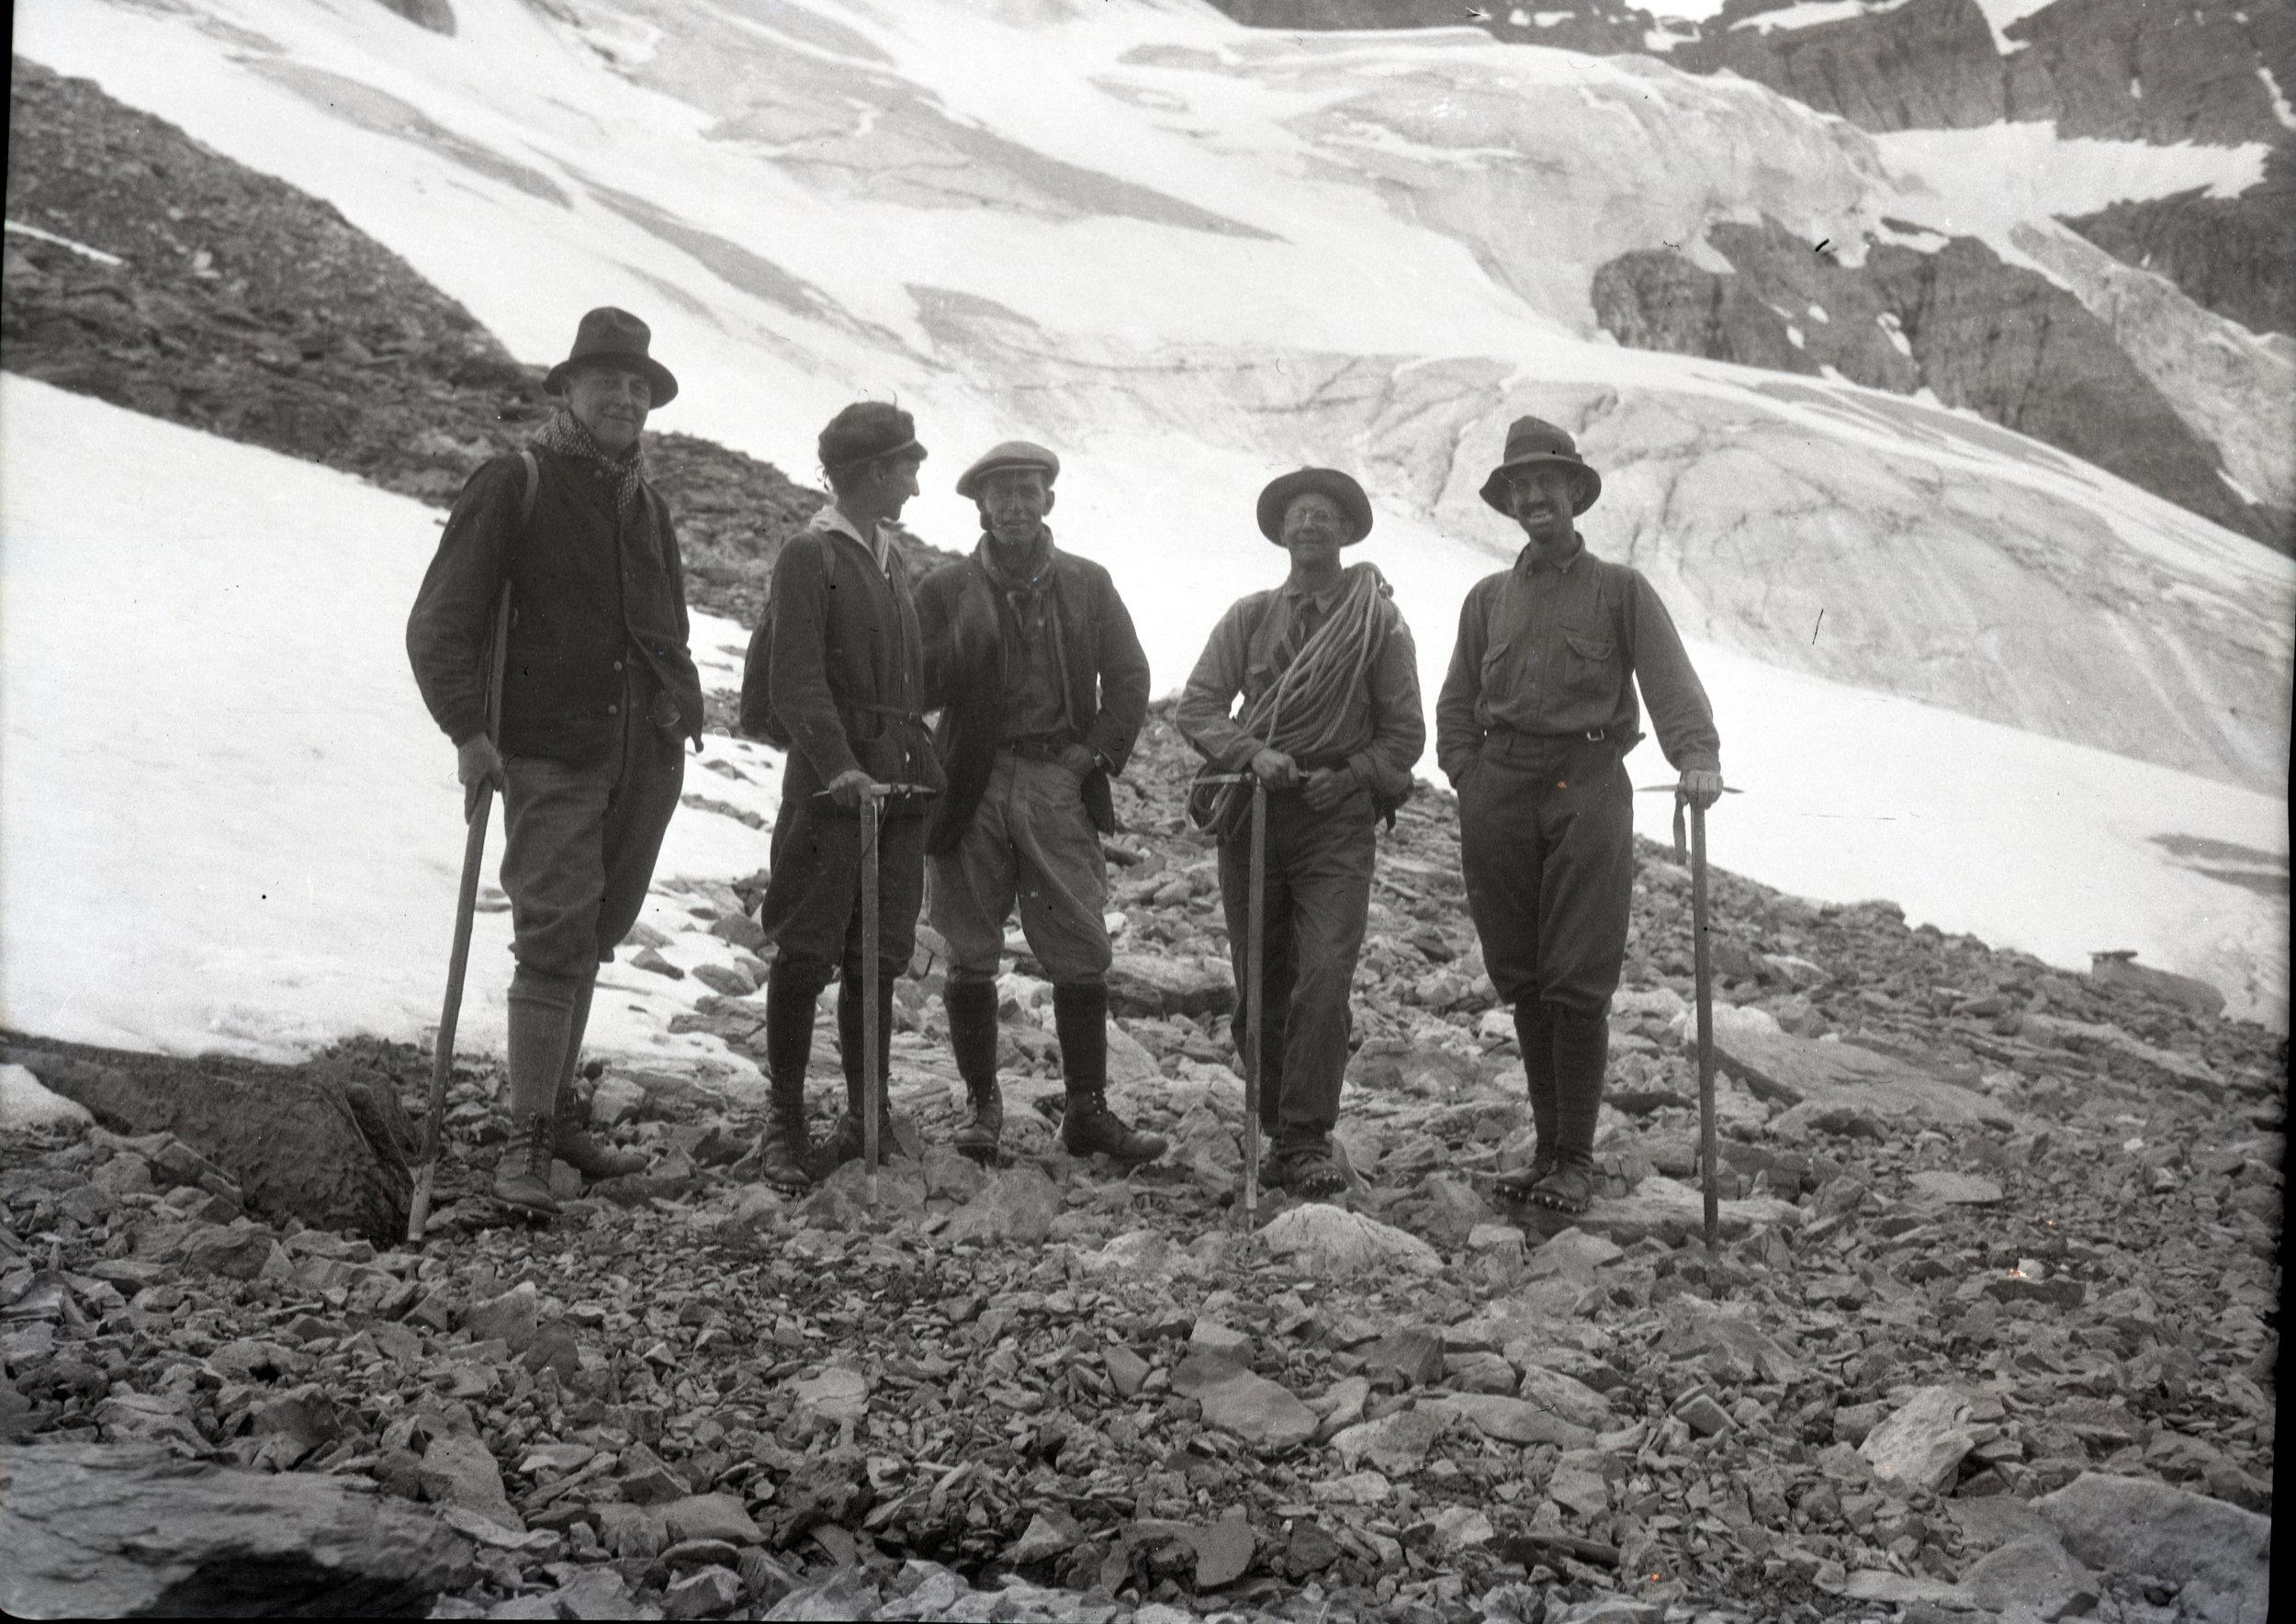 Climbing group on Mount Odaray